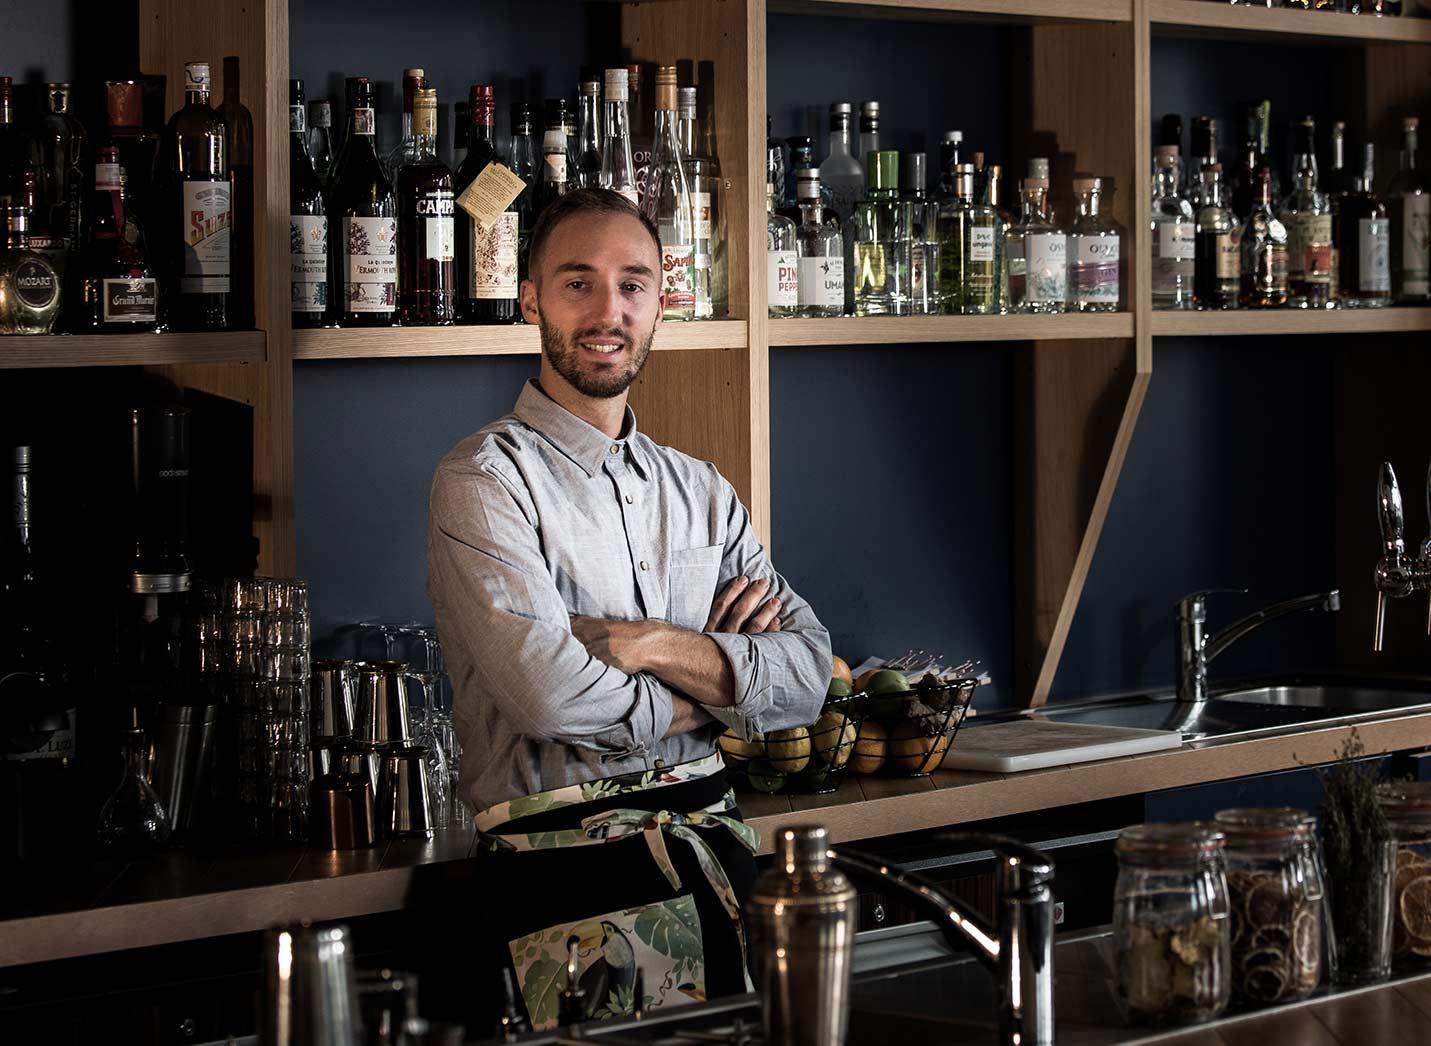 airmail cocktail bartender mixologue germain